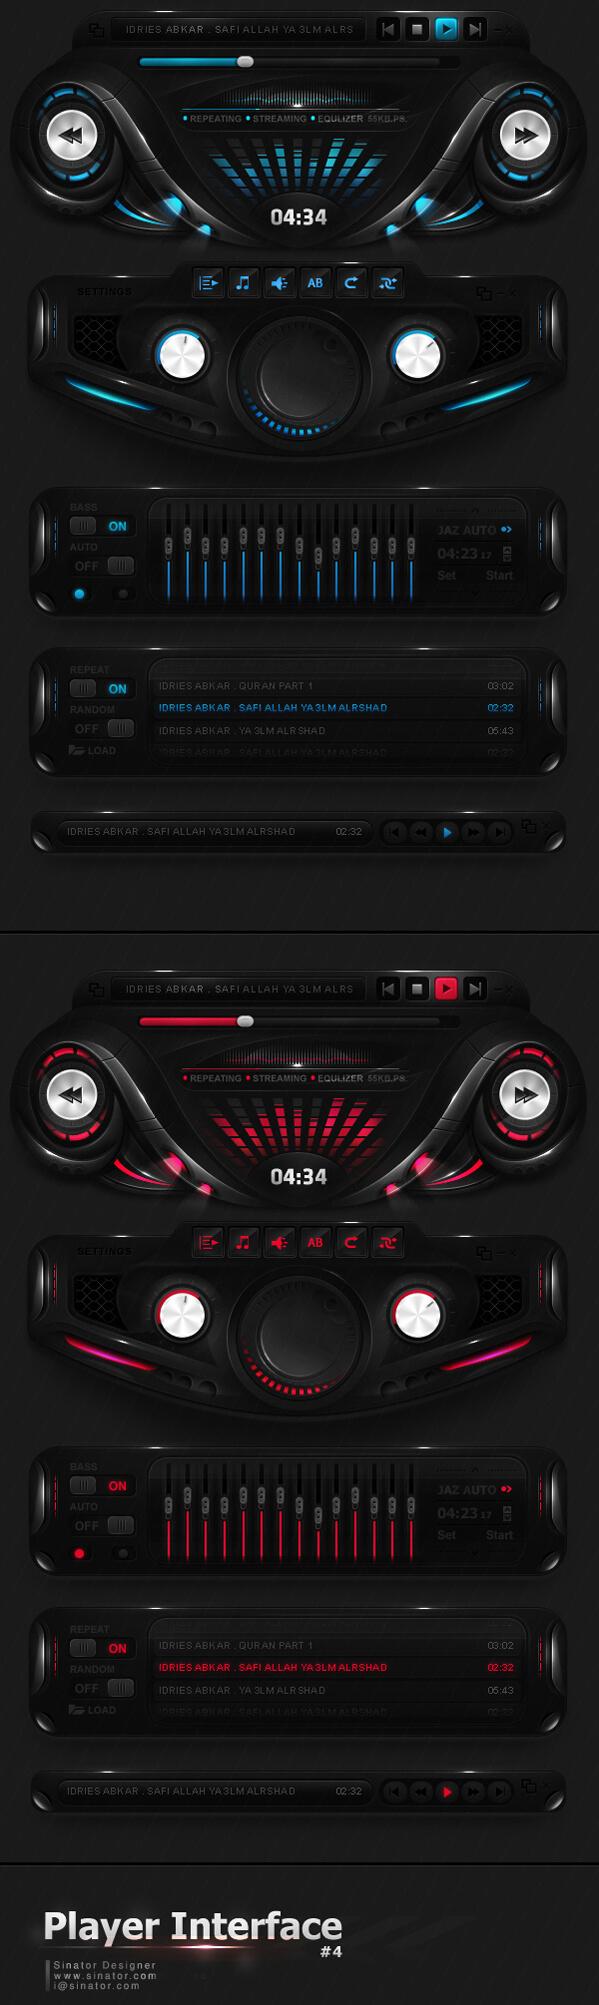 Futuristic Player Interface by sinator-designer